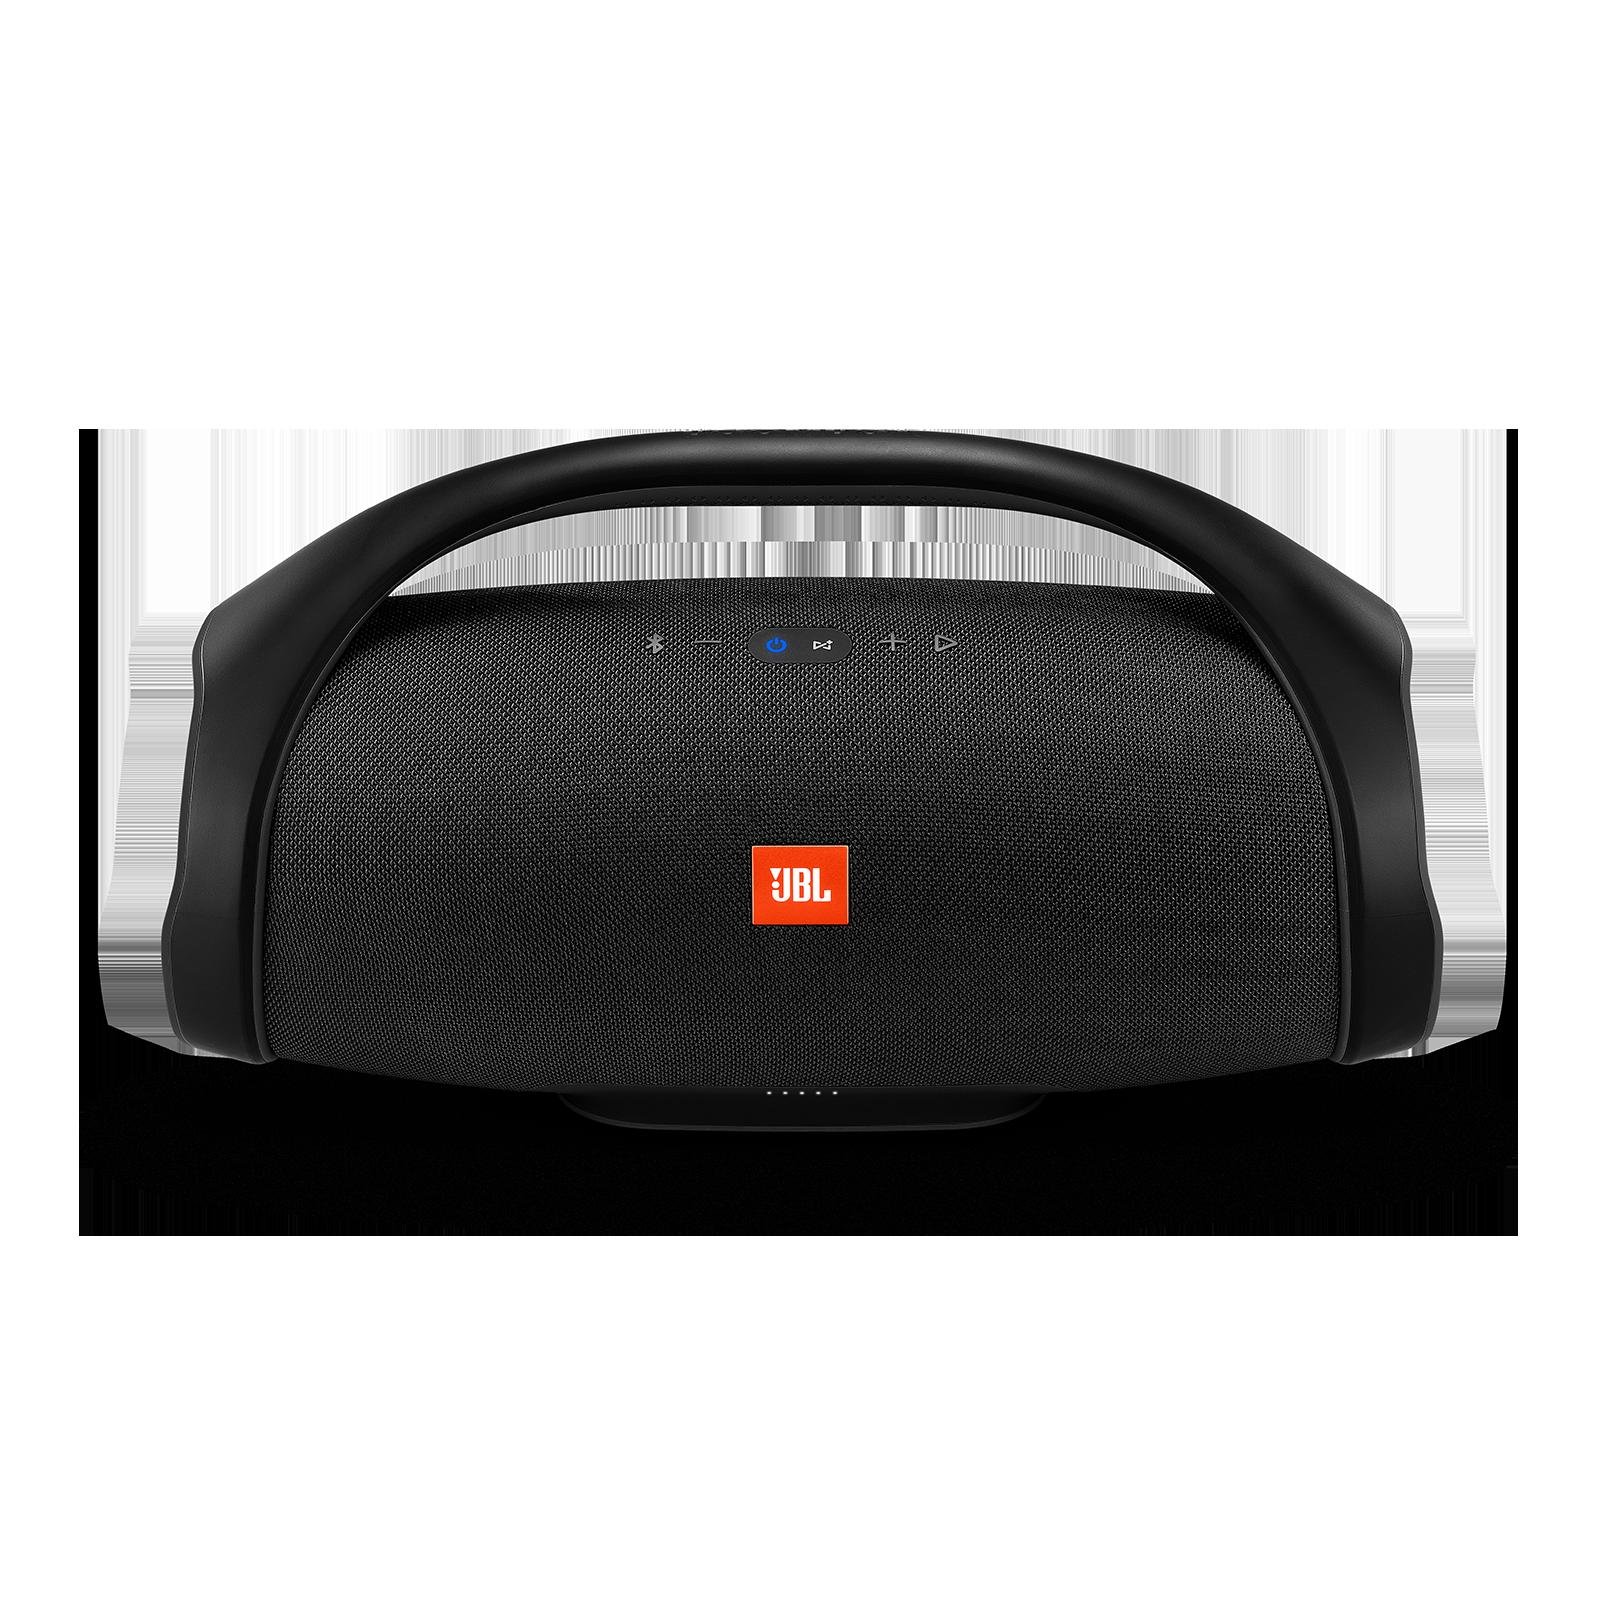 JBL Boombox Portable Bluetooth Speaker - Black (BOOMBOX-BK)